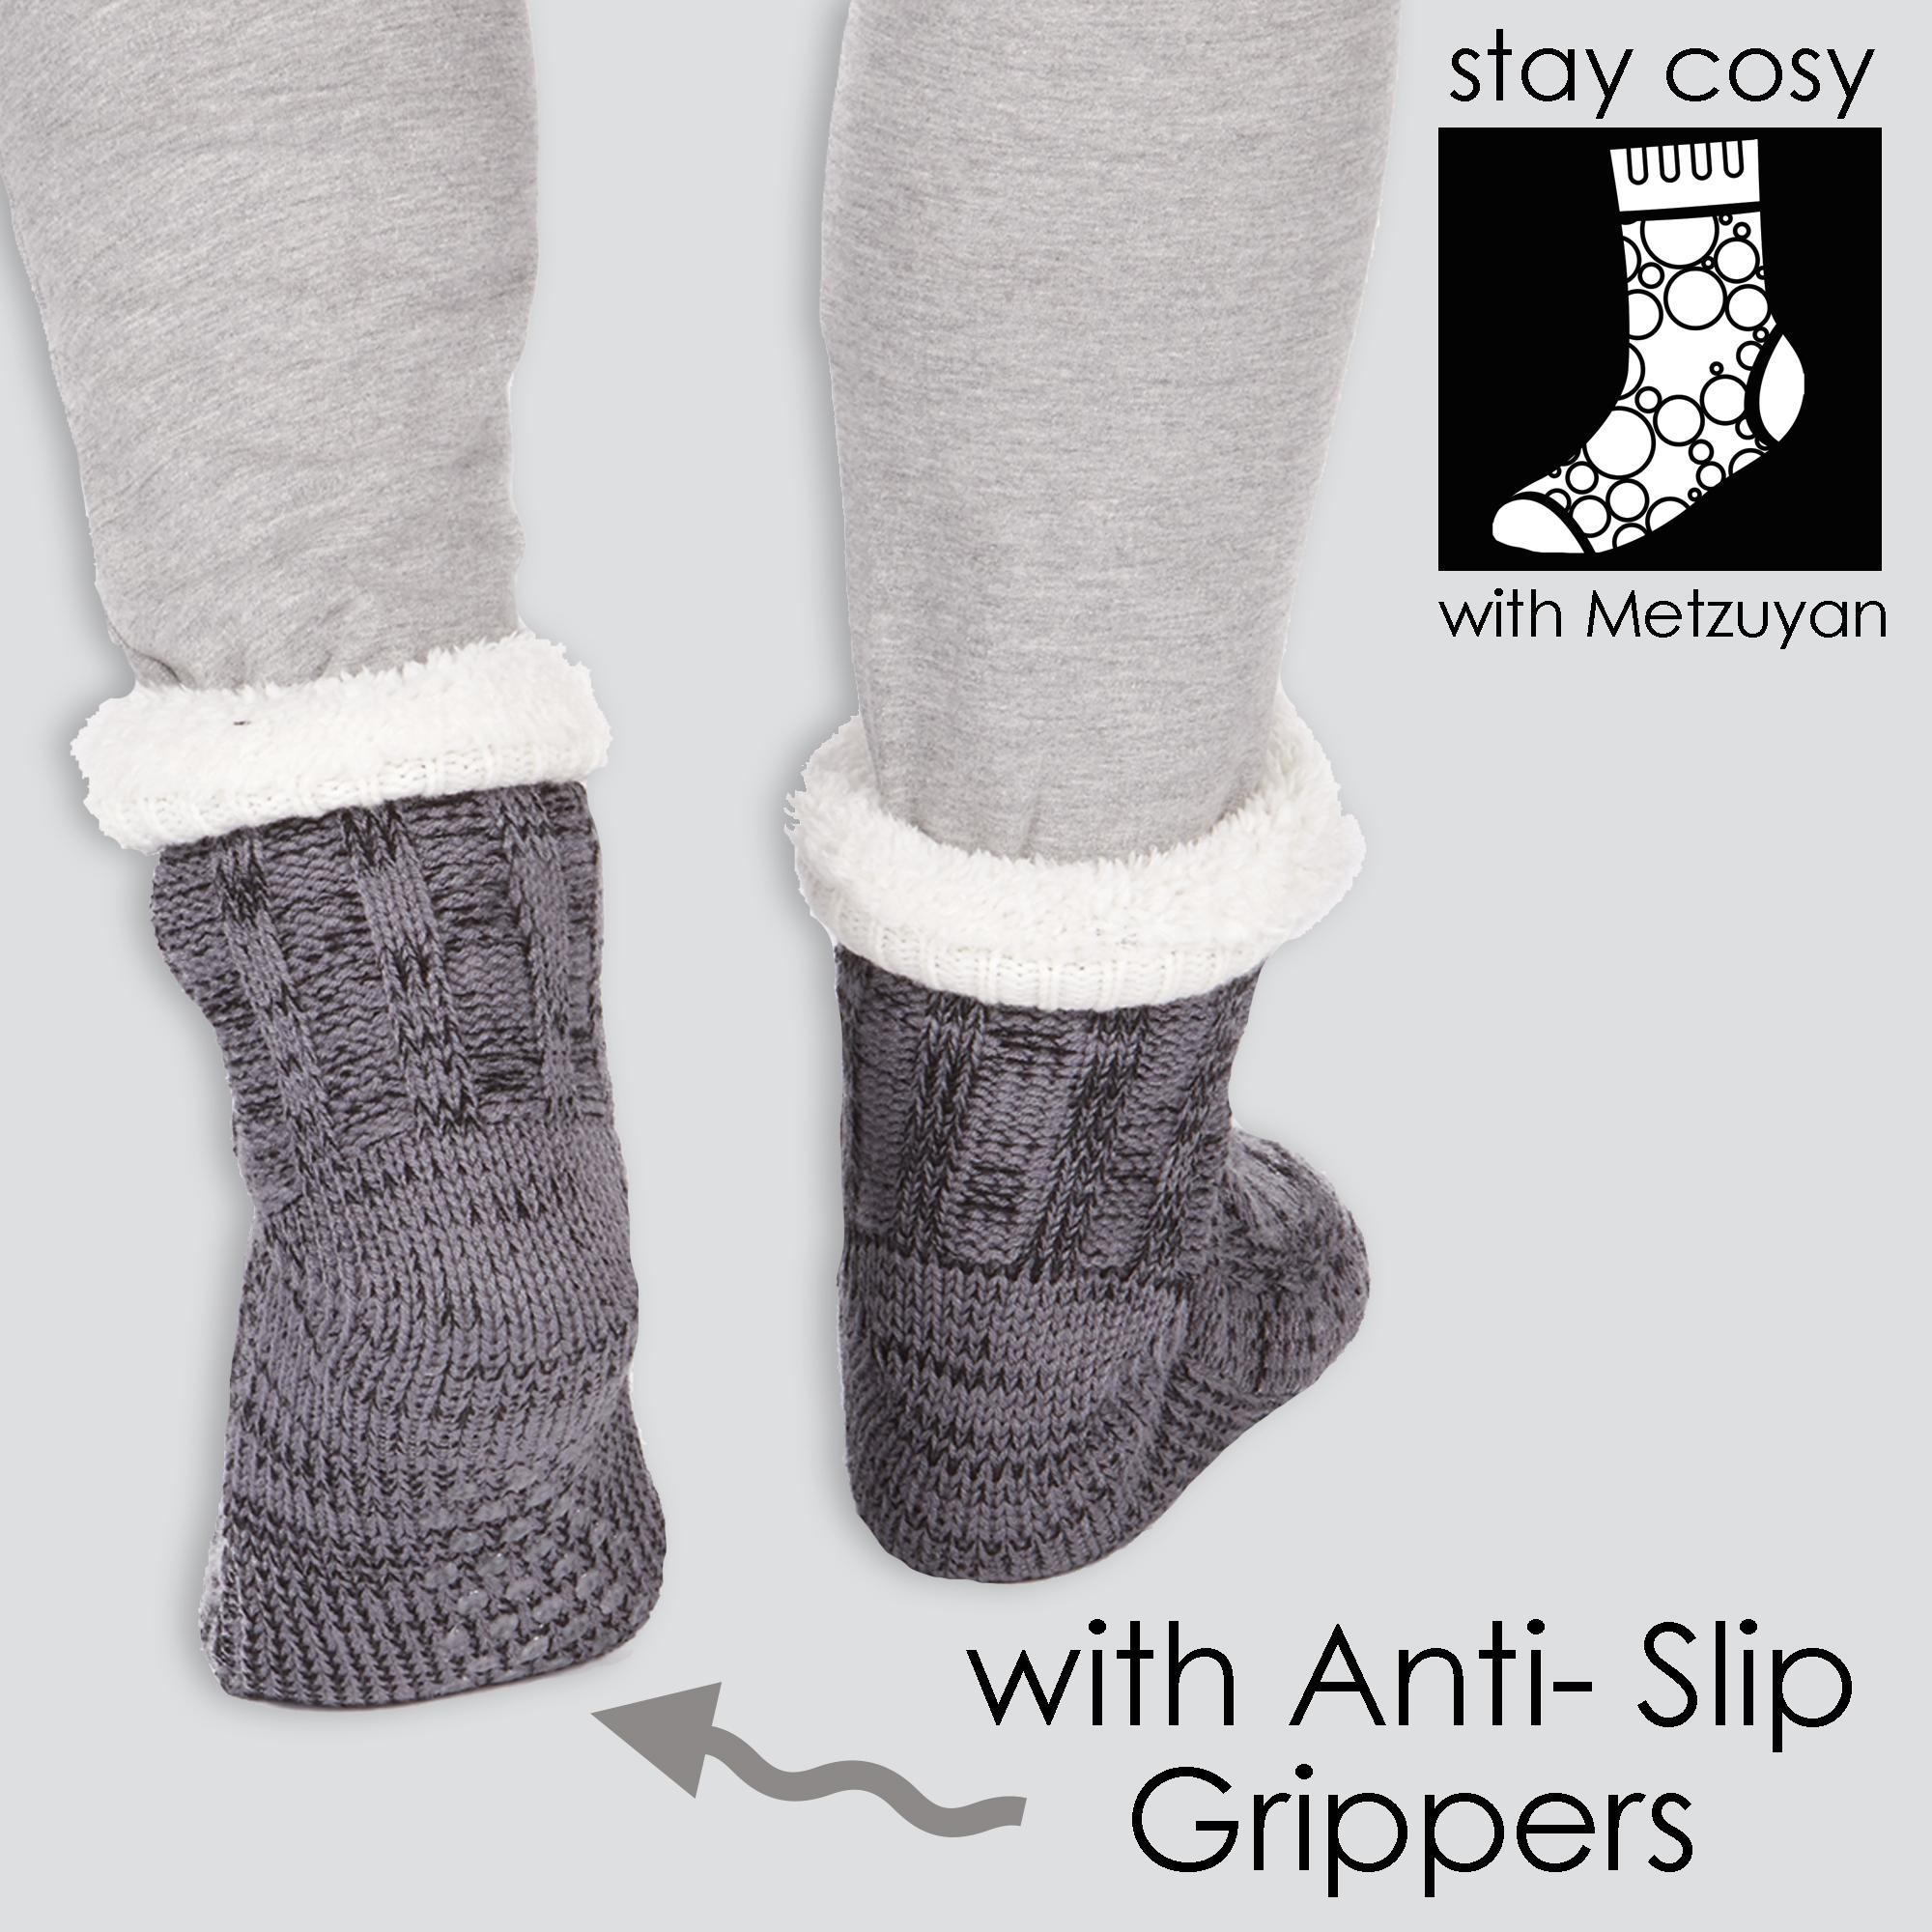 1-Pair-Mens-Grey-Chunky-Knitted-Slipper-Socks-Lounge-Thermal-Ultra-Warm-UK-6-11 thumbnail 5